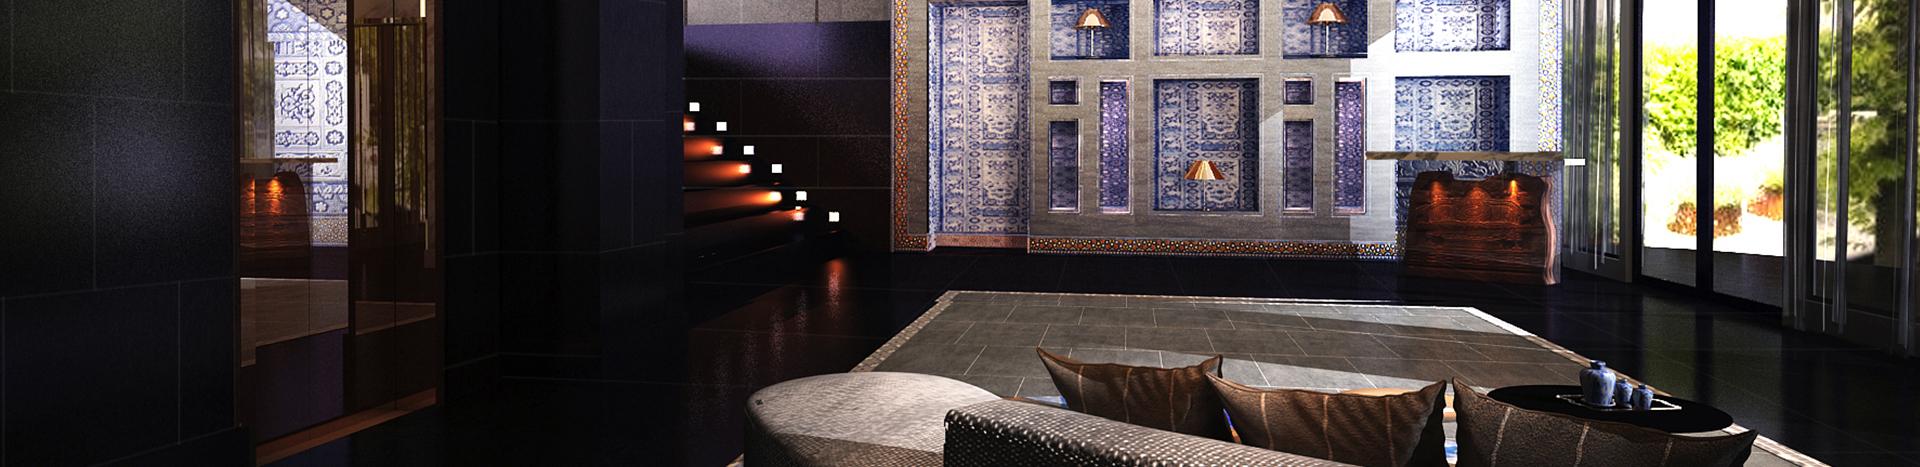 kayre-international-hotel-architecture-pakistan-hotel-design-sohohospitality